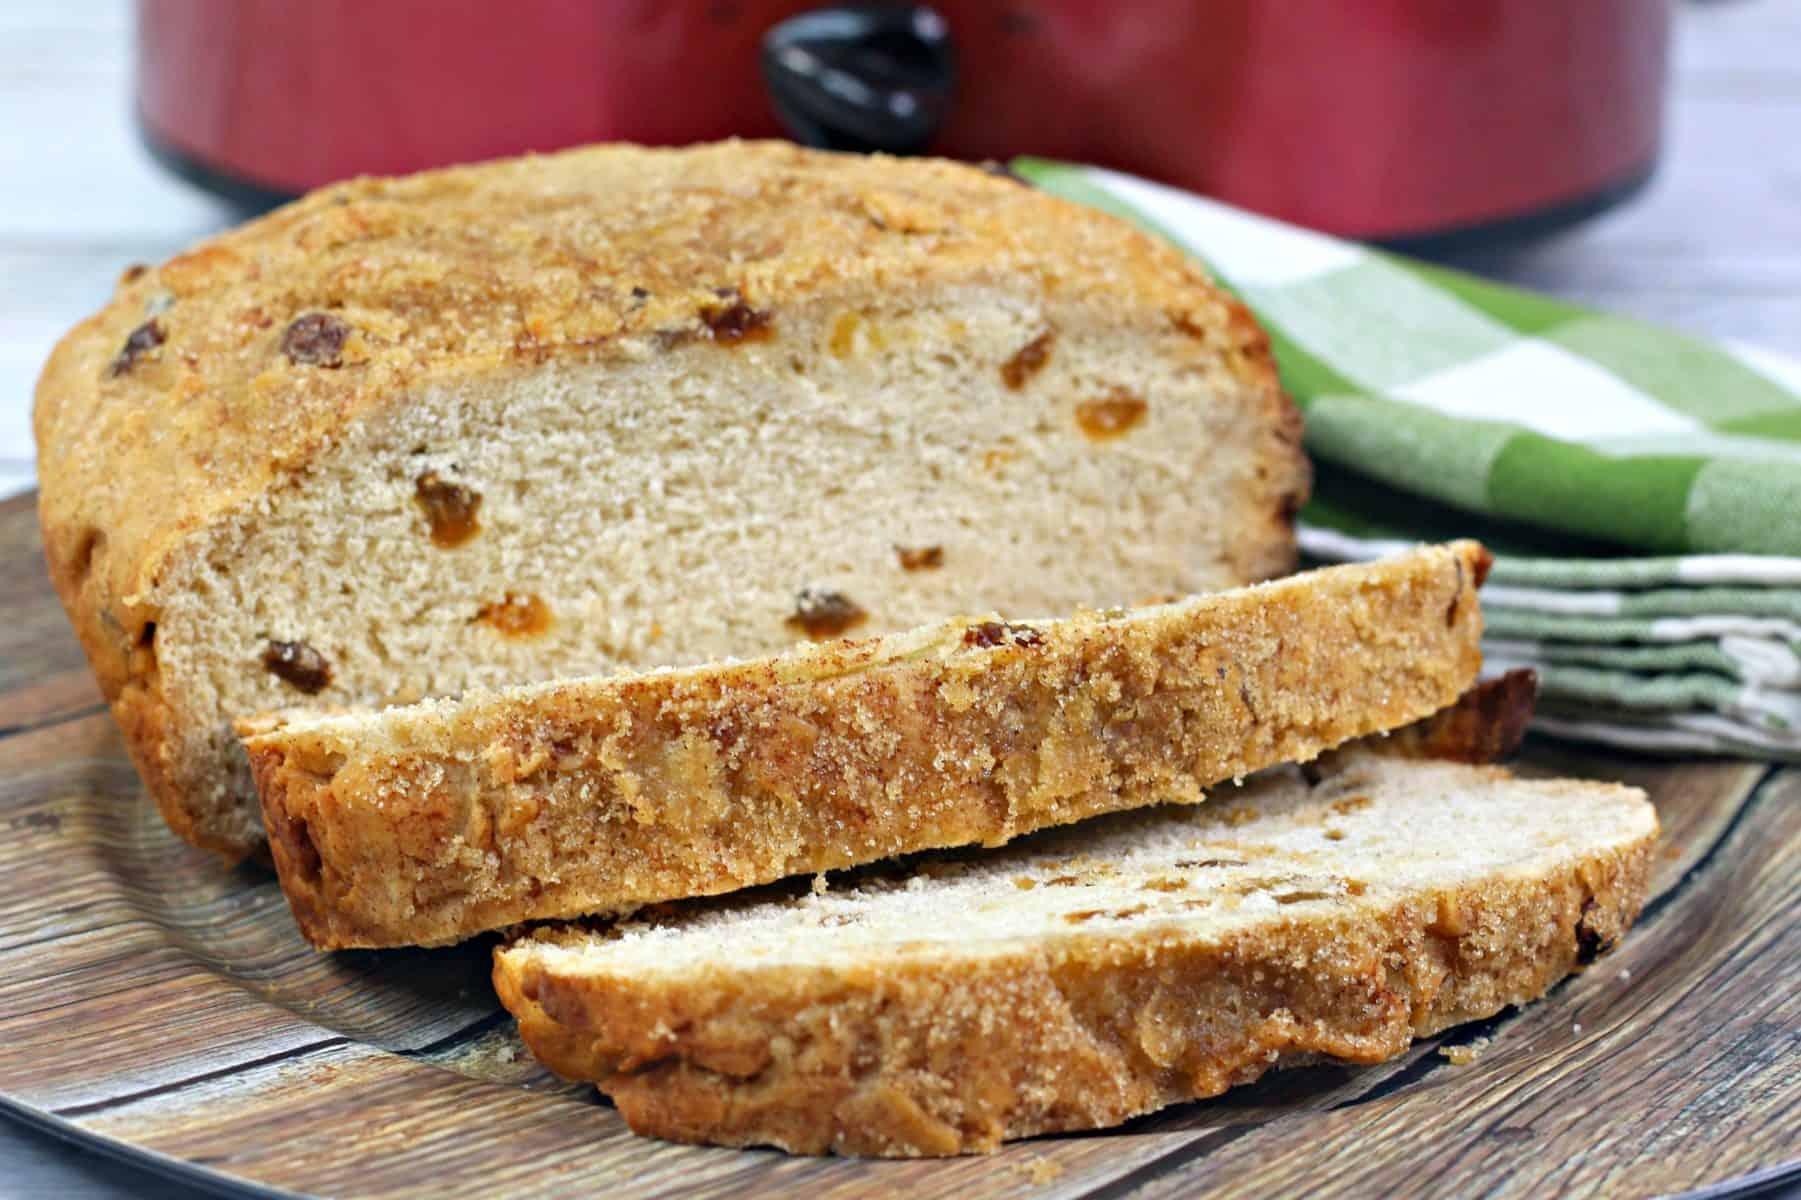 cinnamon raisin bread, slow cooker yeast bread recipe